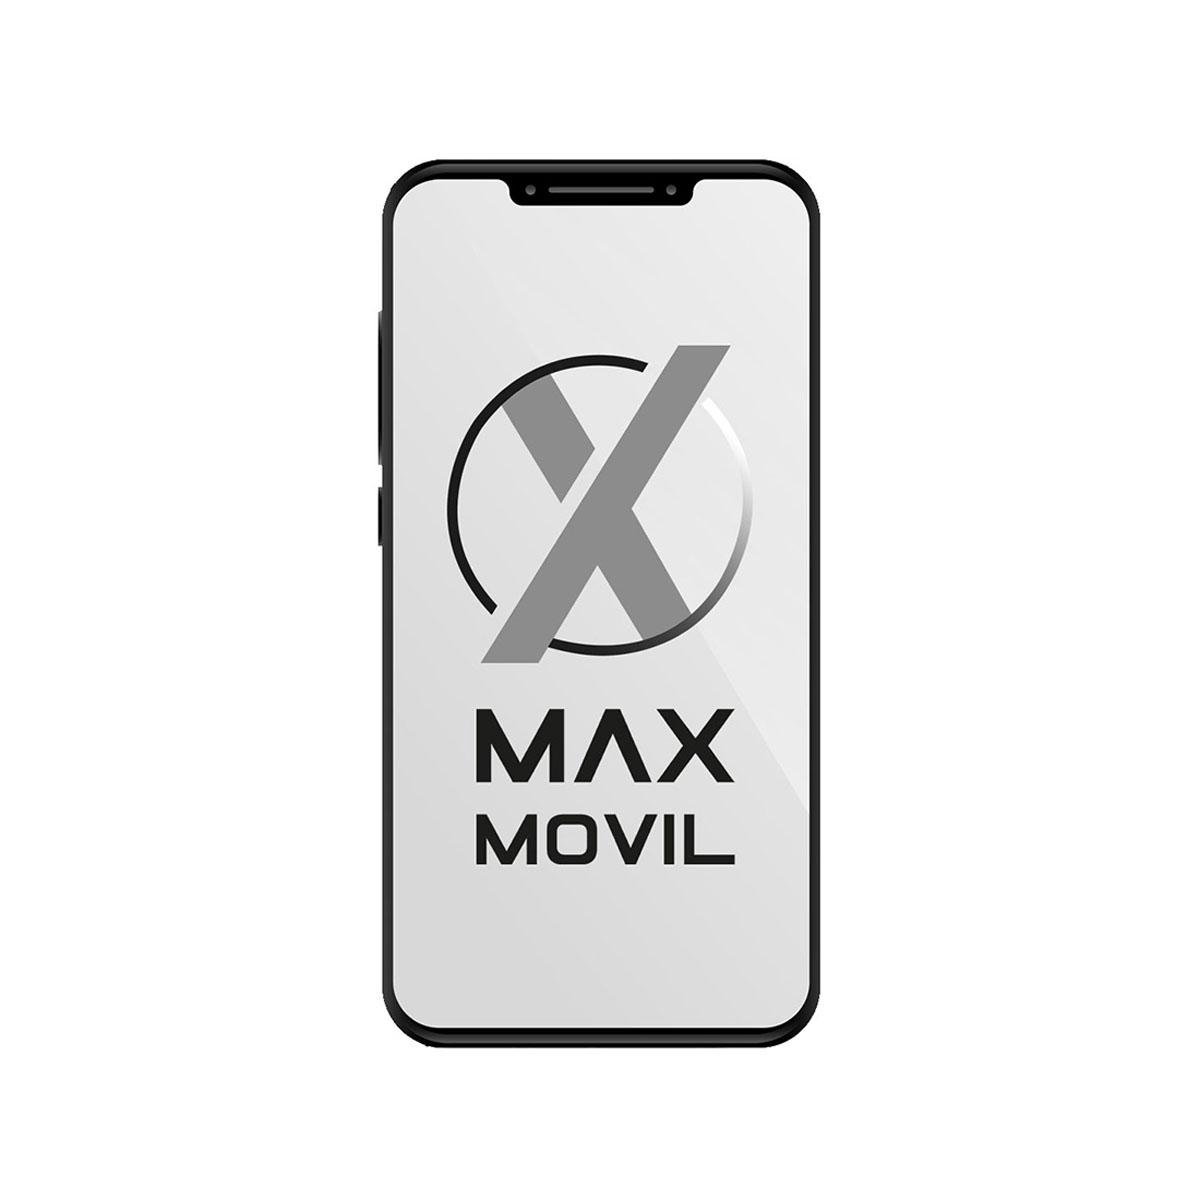 Accesorios PI020312 para botonera Parrot  MKI , soporte y pila